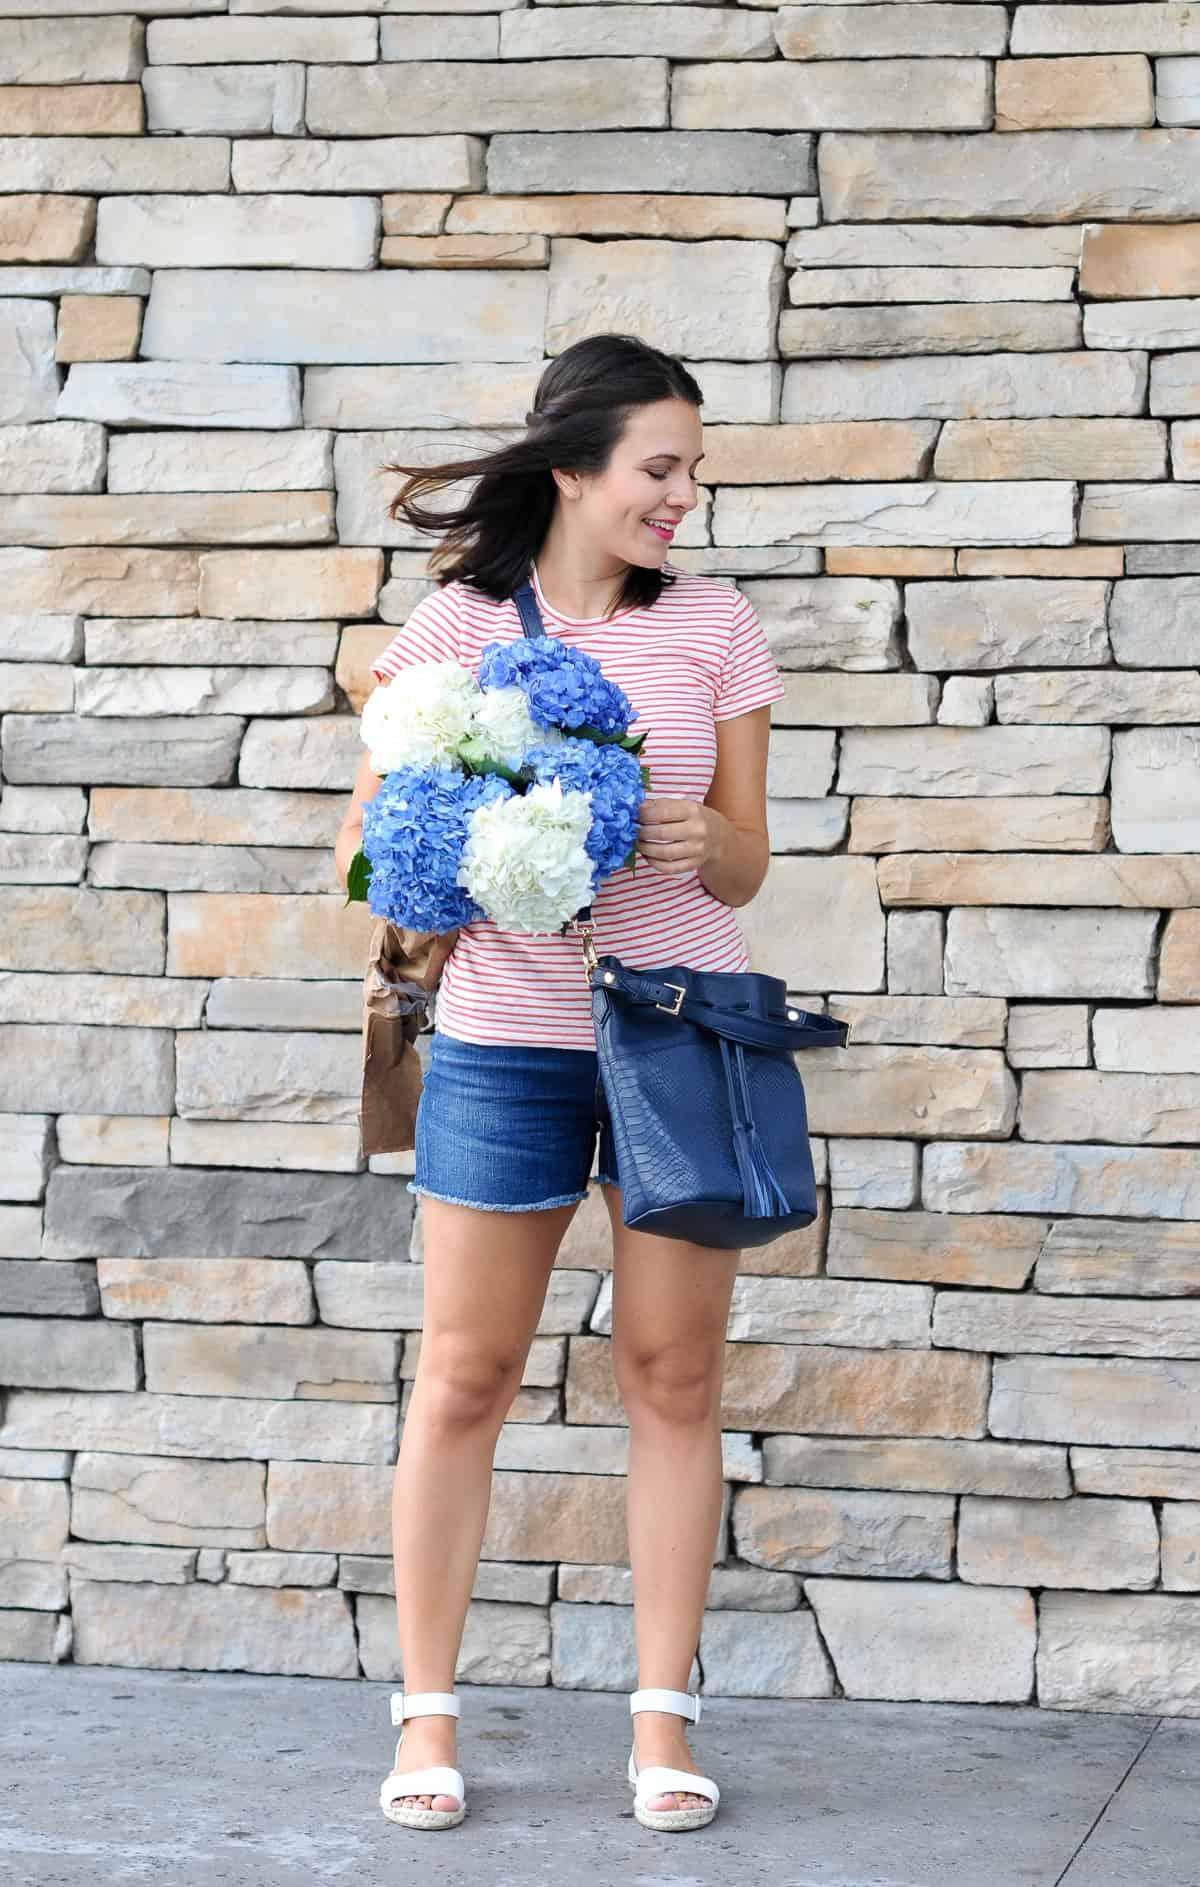 J.Crew summer outfit, hydrangeas, flowers via @mystylevita